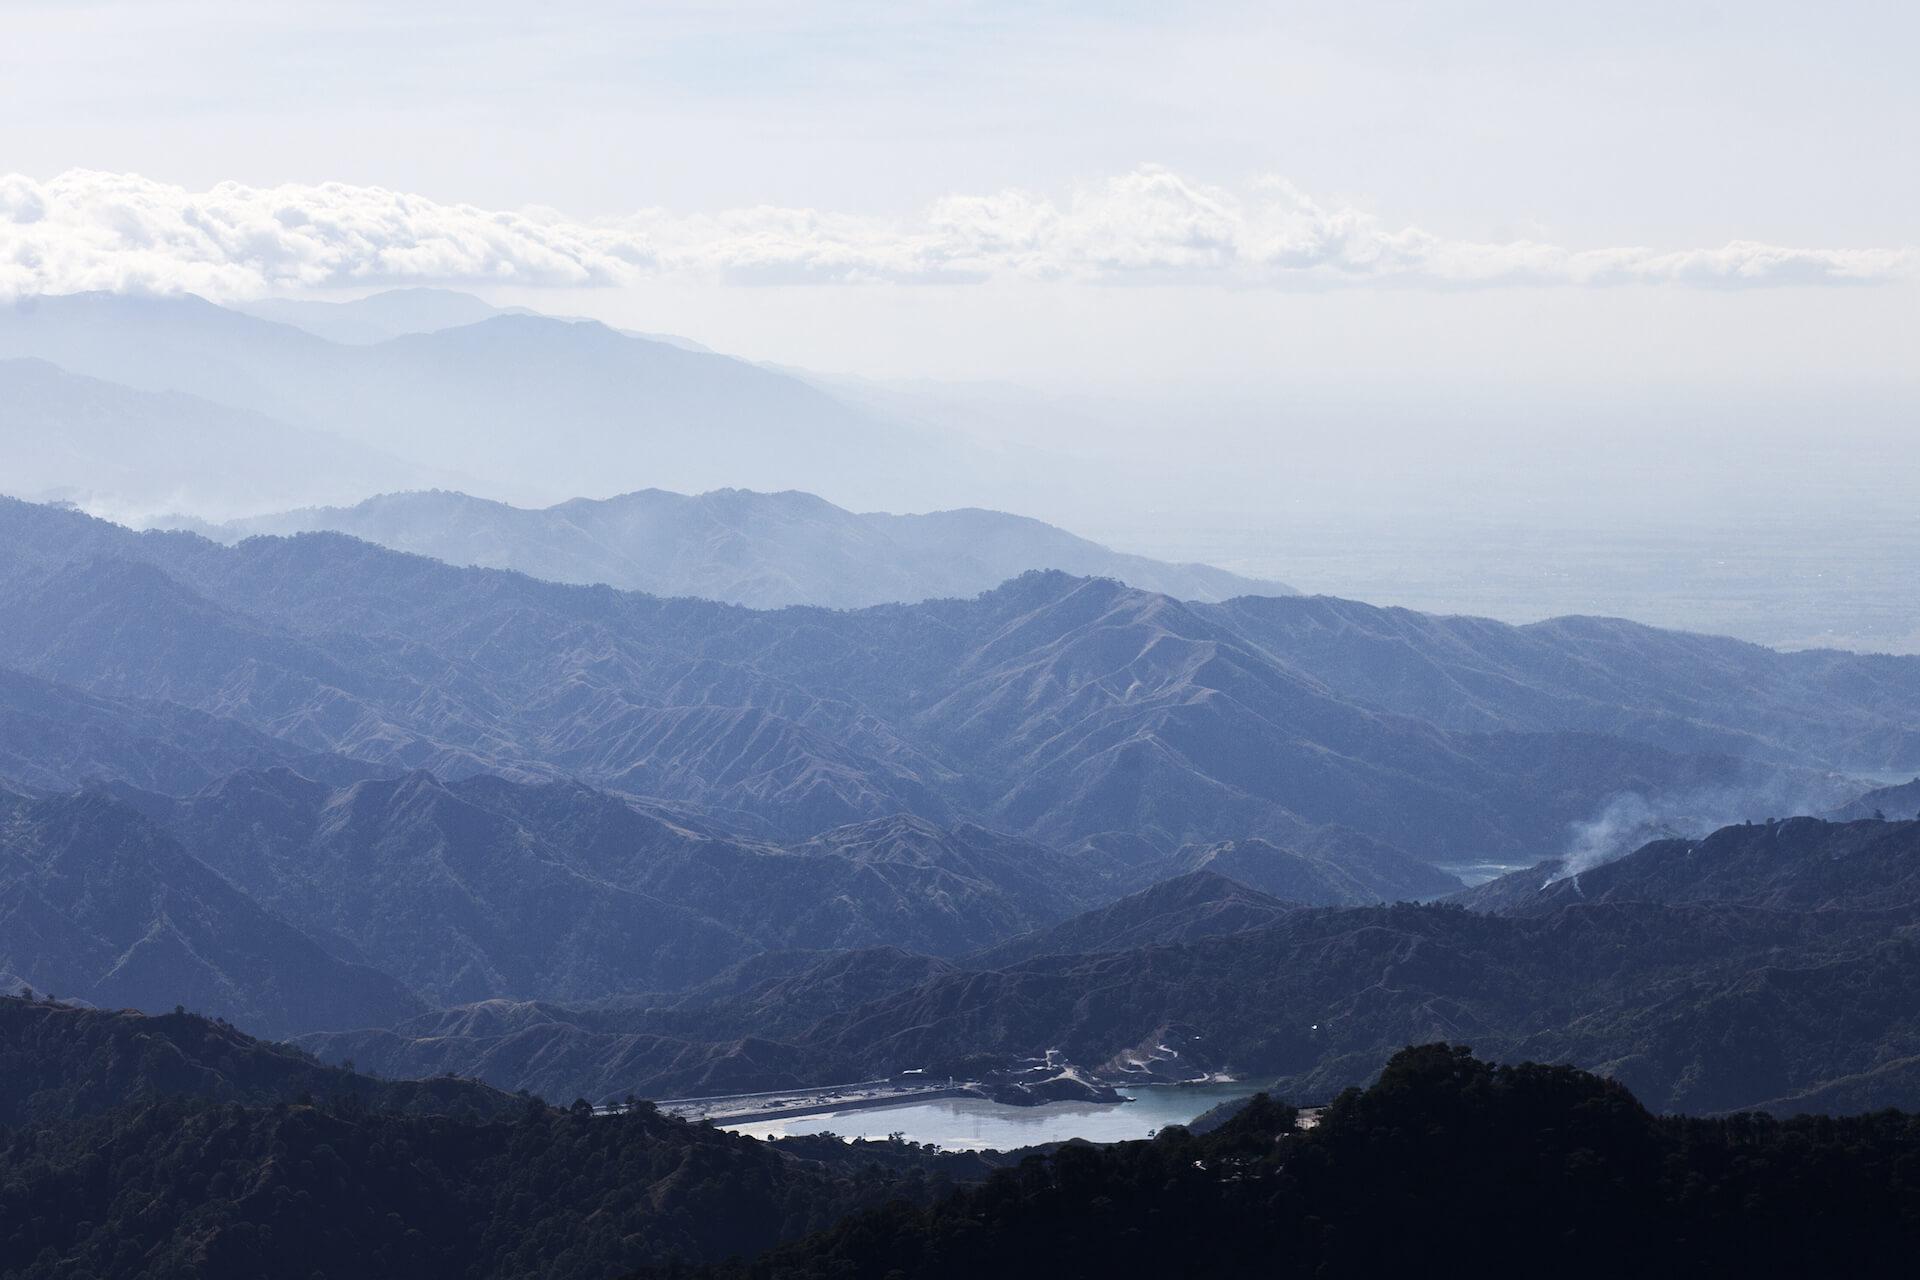 Benguet, Baguio, Mountain Province view